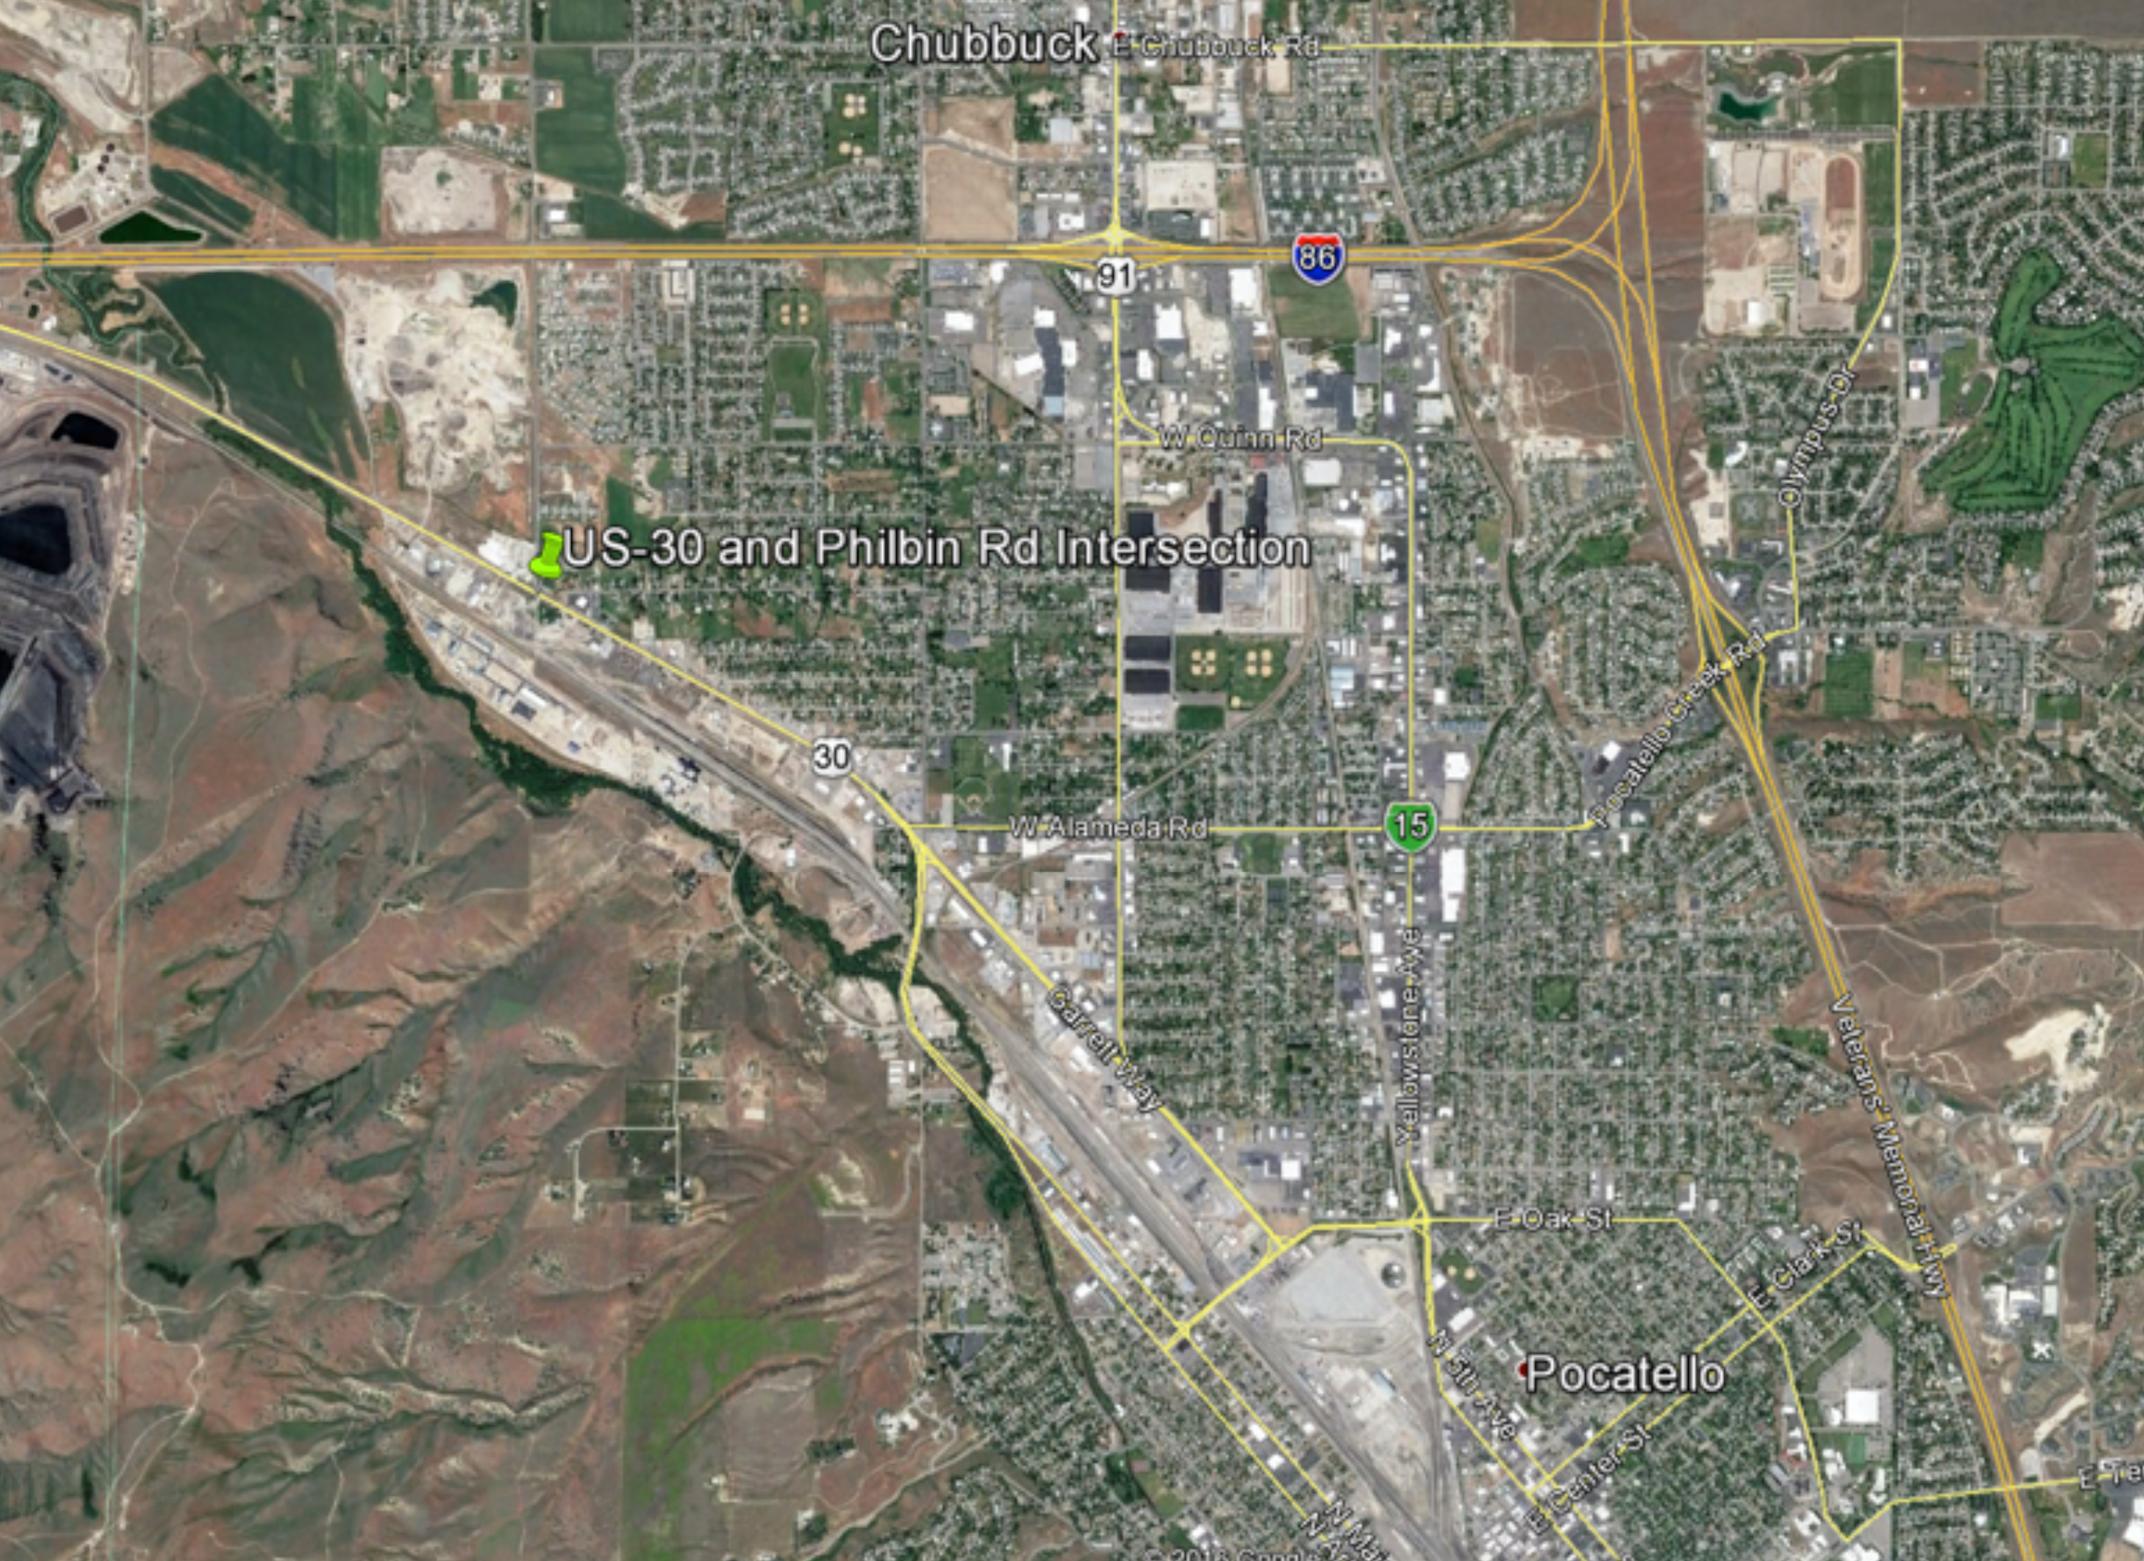 US-30: Philbin Road Intersection